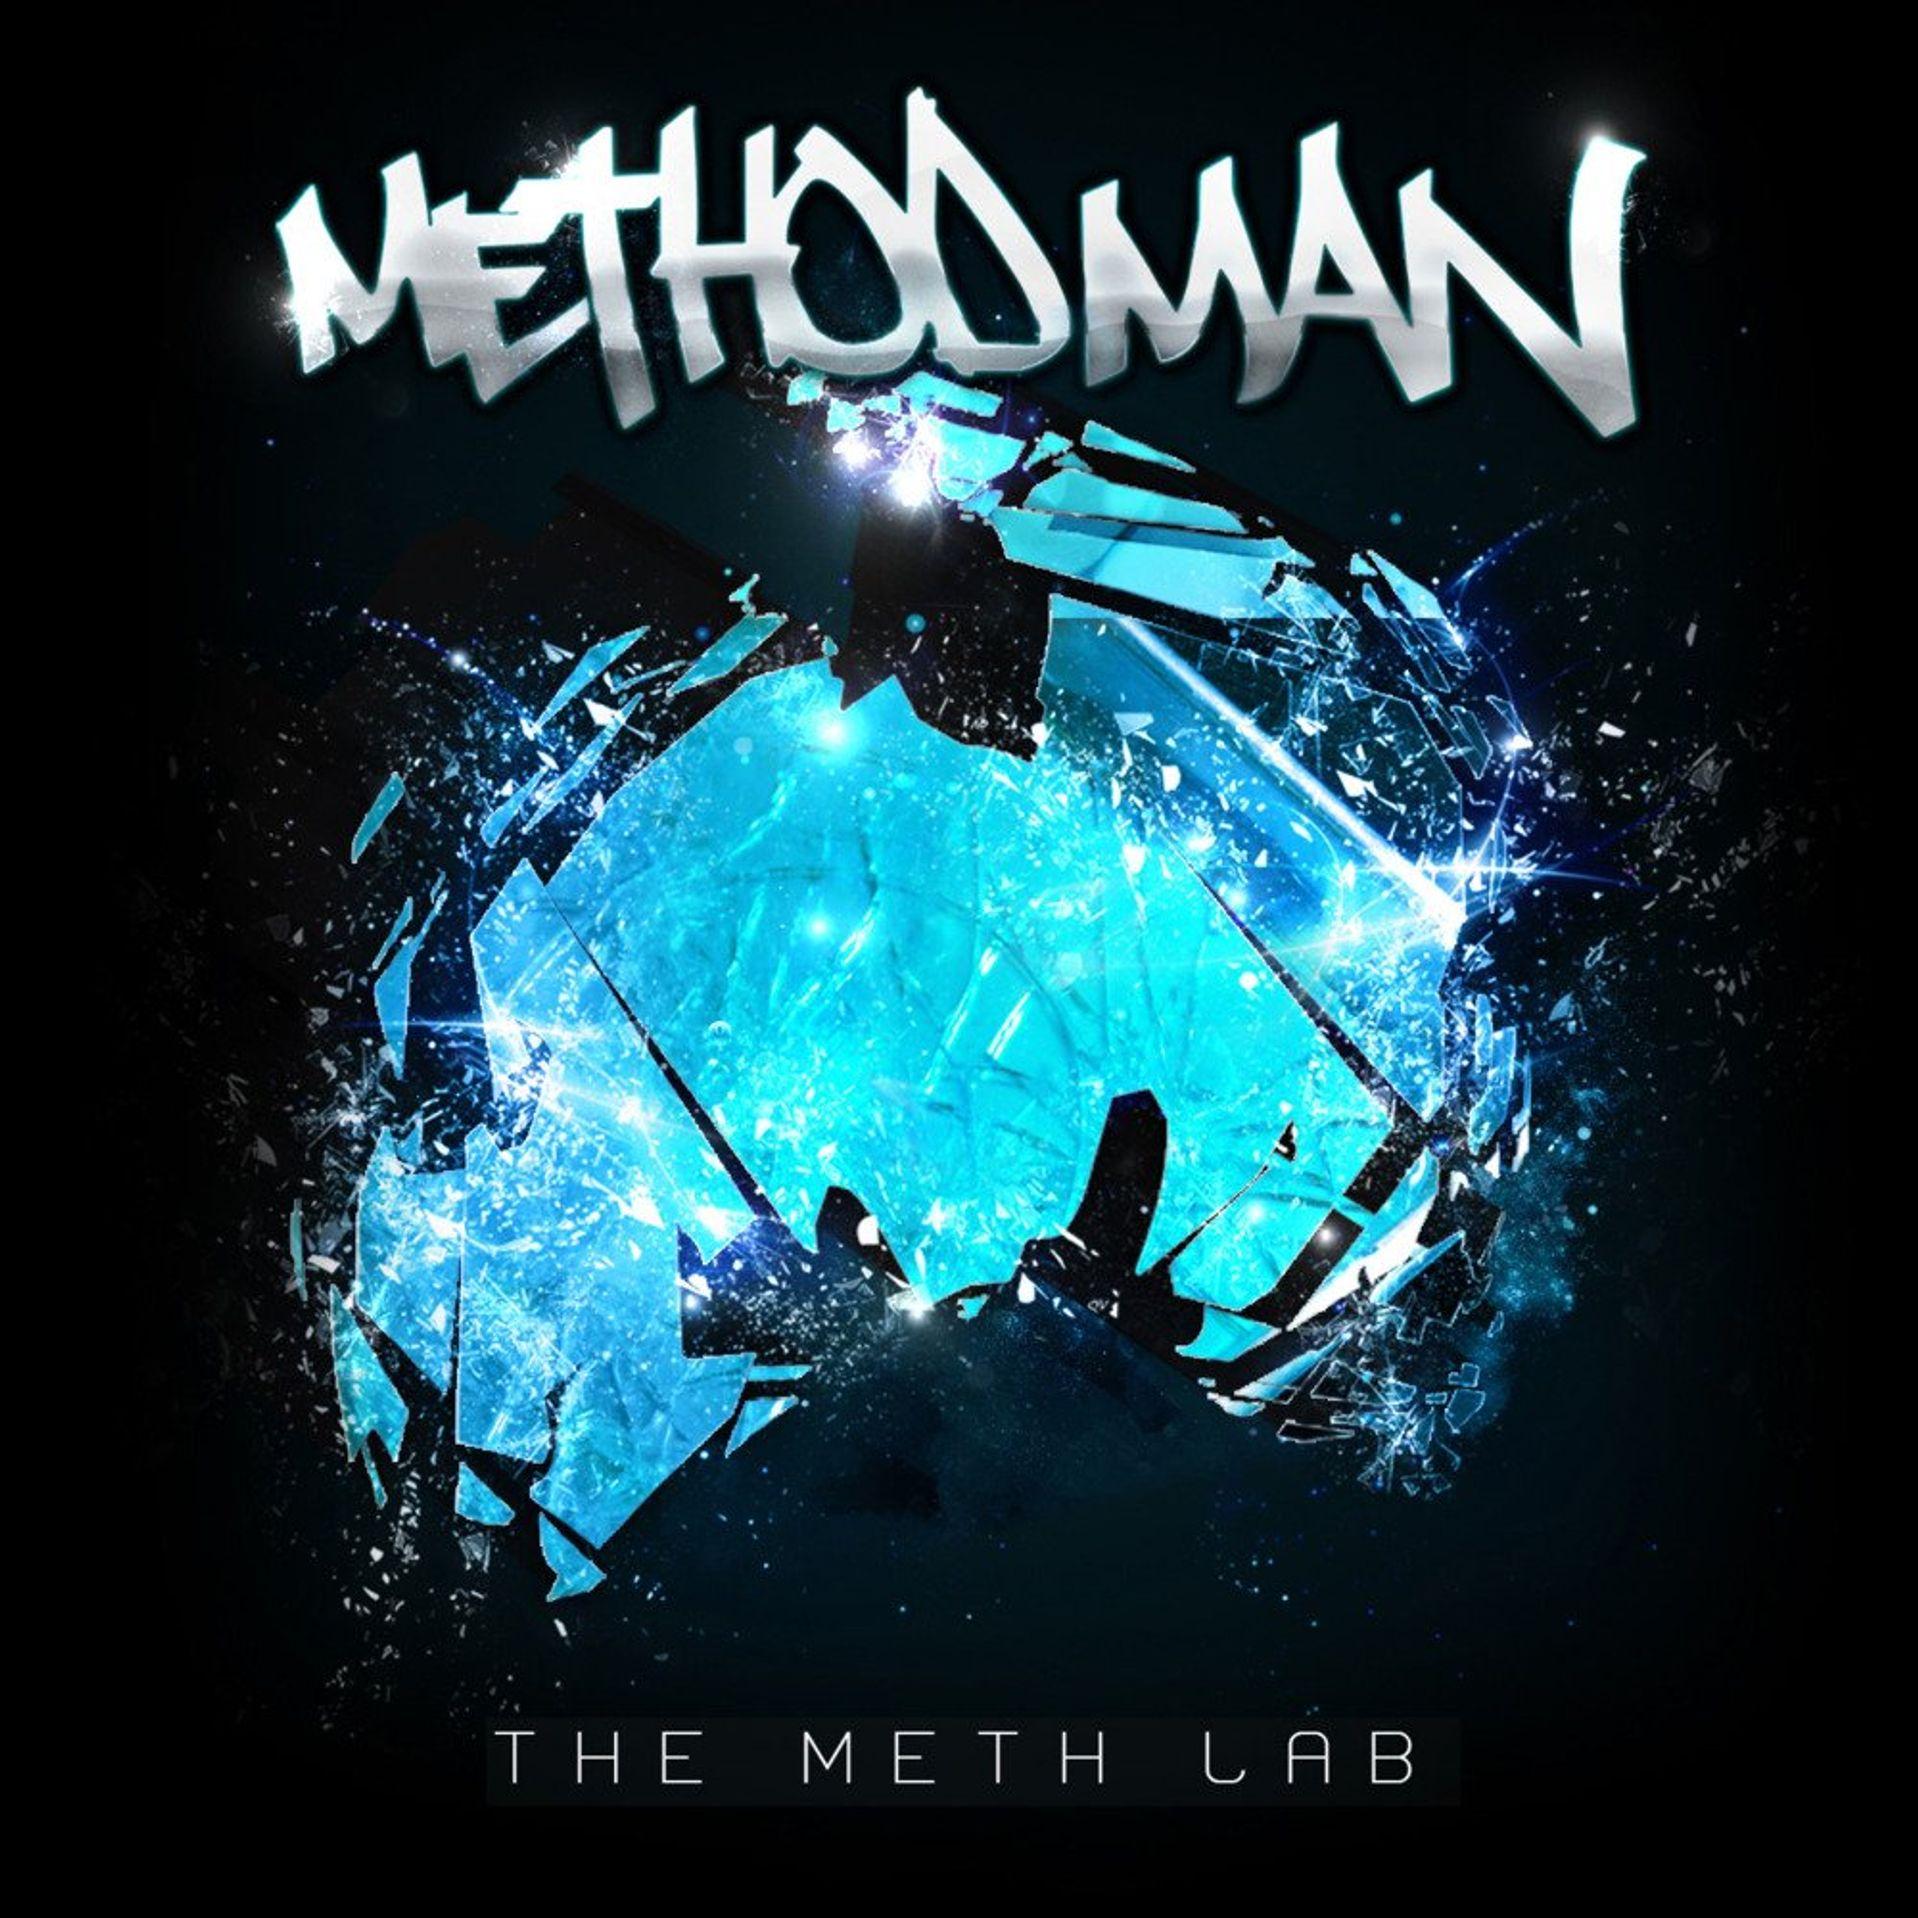 Album Title: The Meth Lab by: Method Man